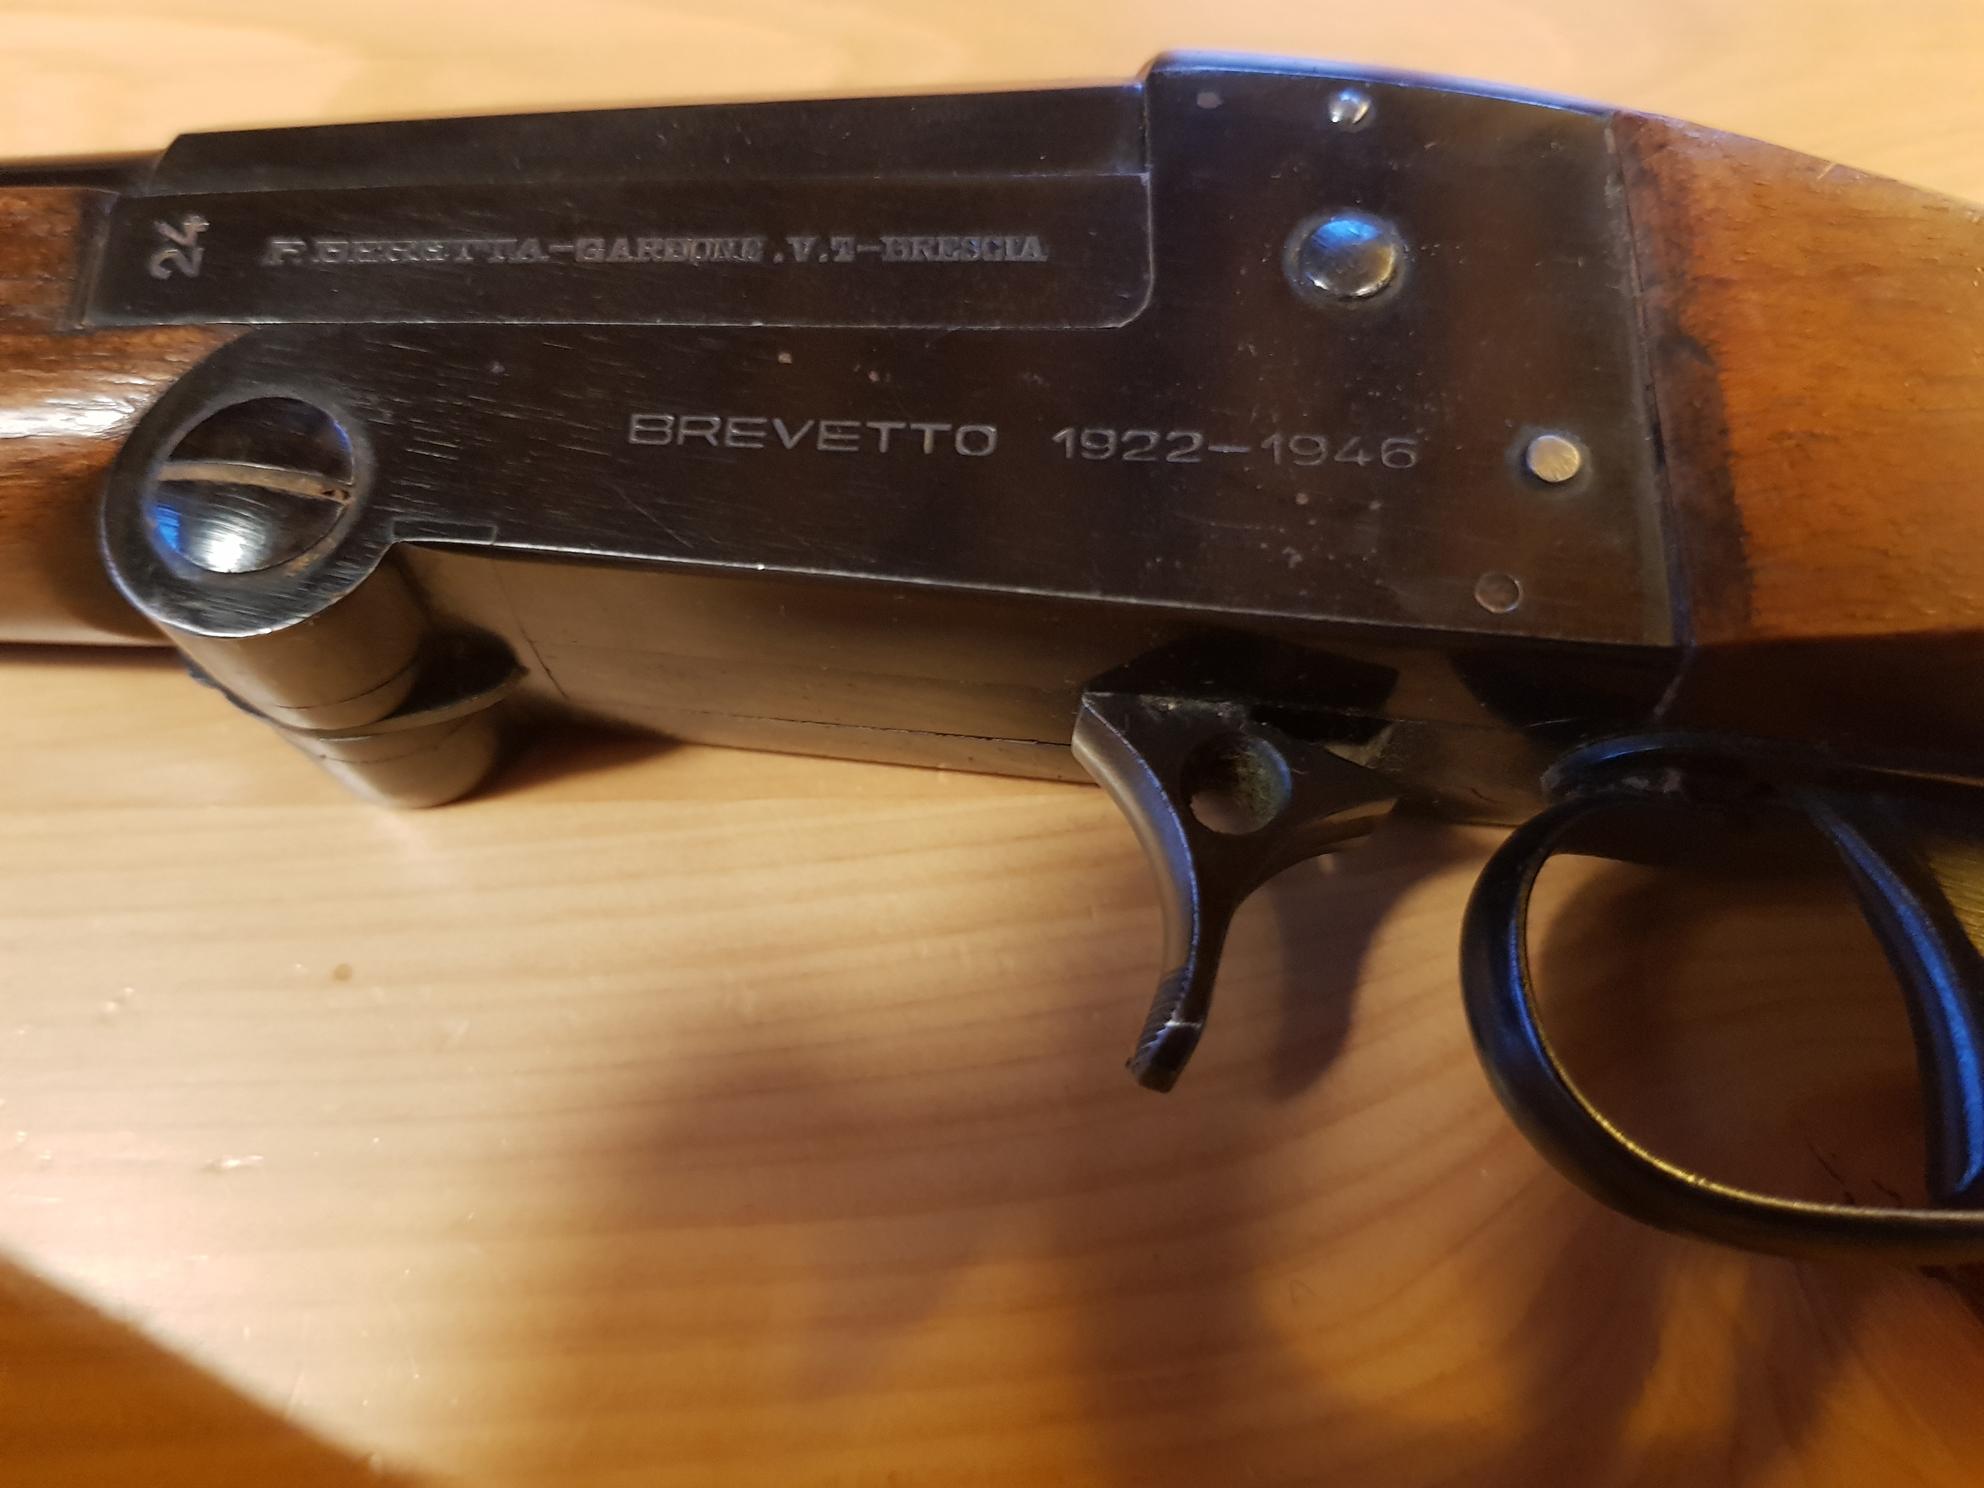 Fucile storico Beretta cal. 24